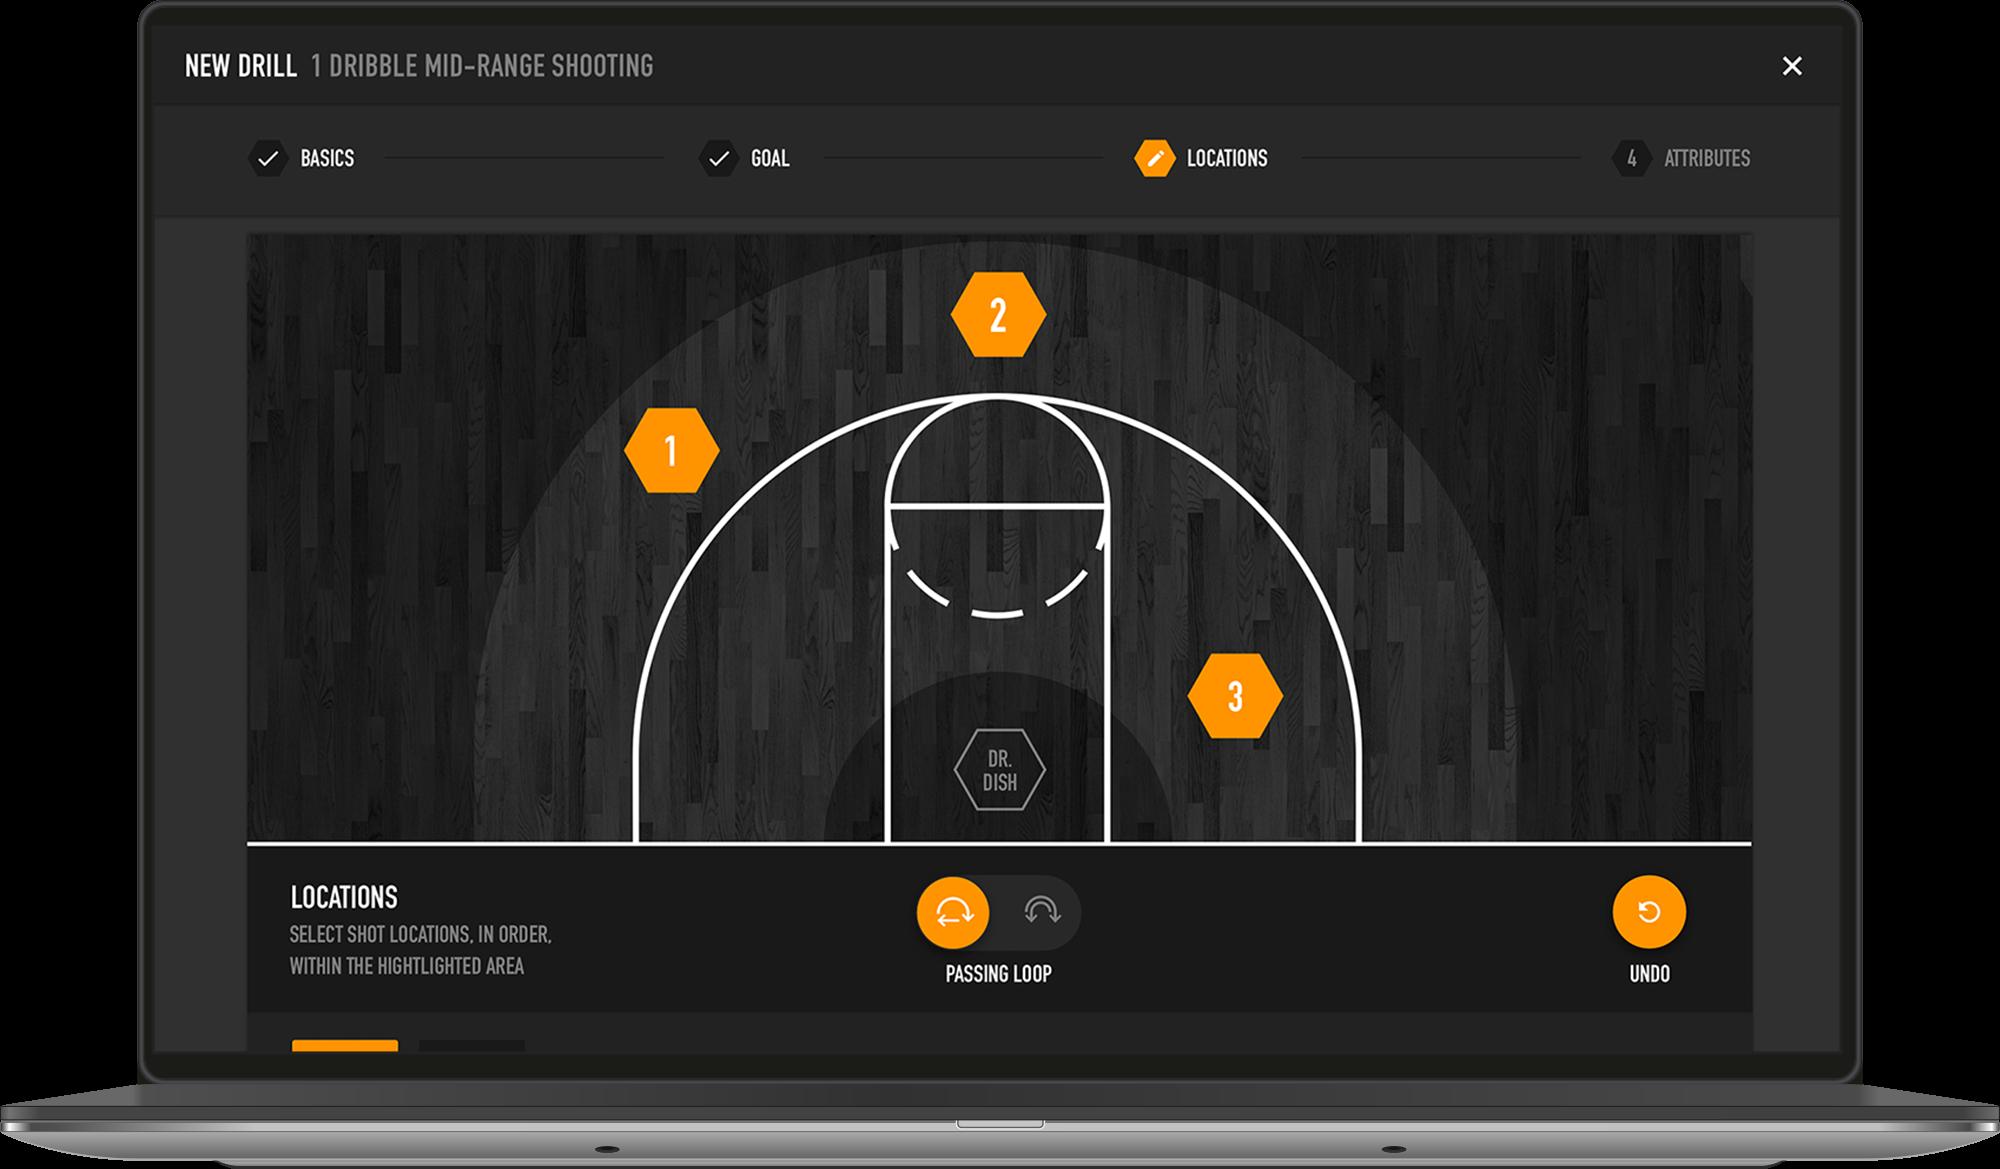 Dr. Dish All-Star Basketball Training Machine- Custom Drills